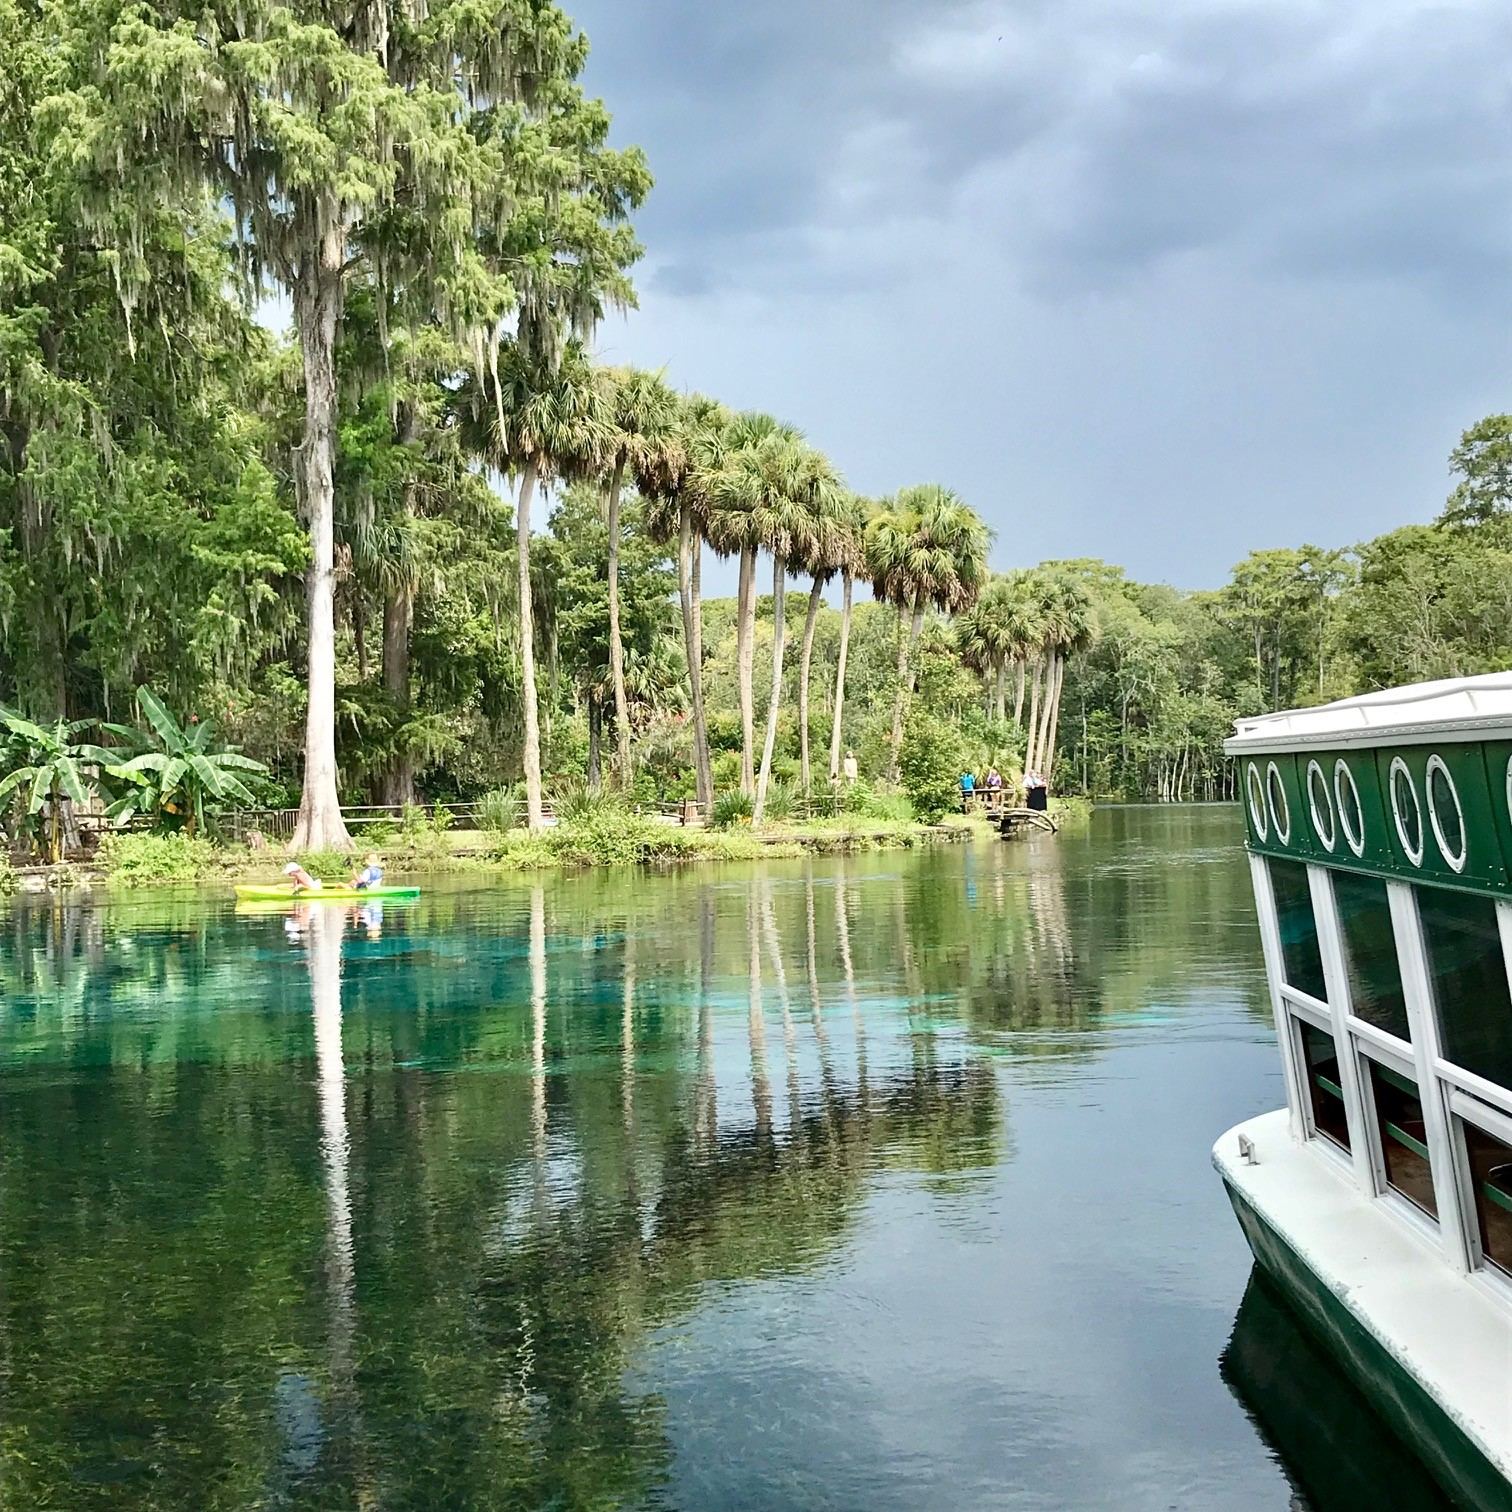 Silver Springs Silvers: Family Getaway In Ocala, Florida